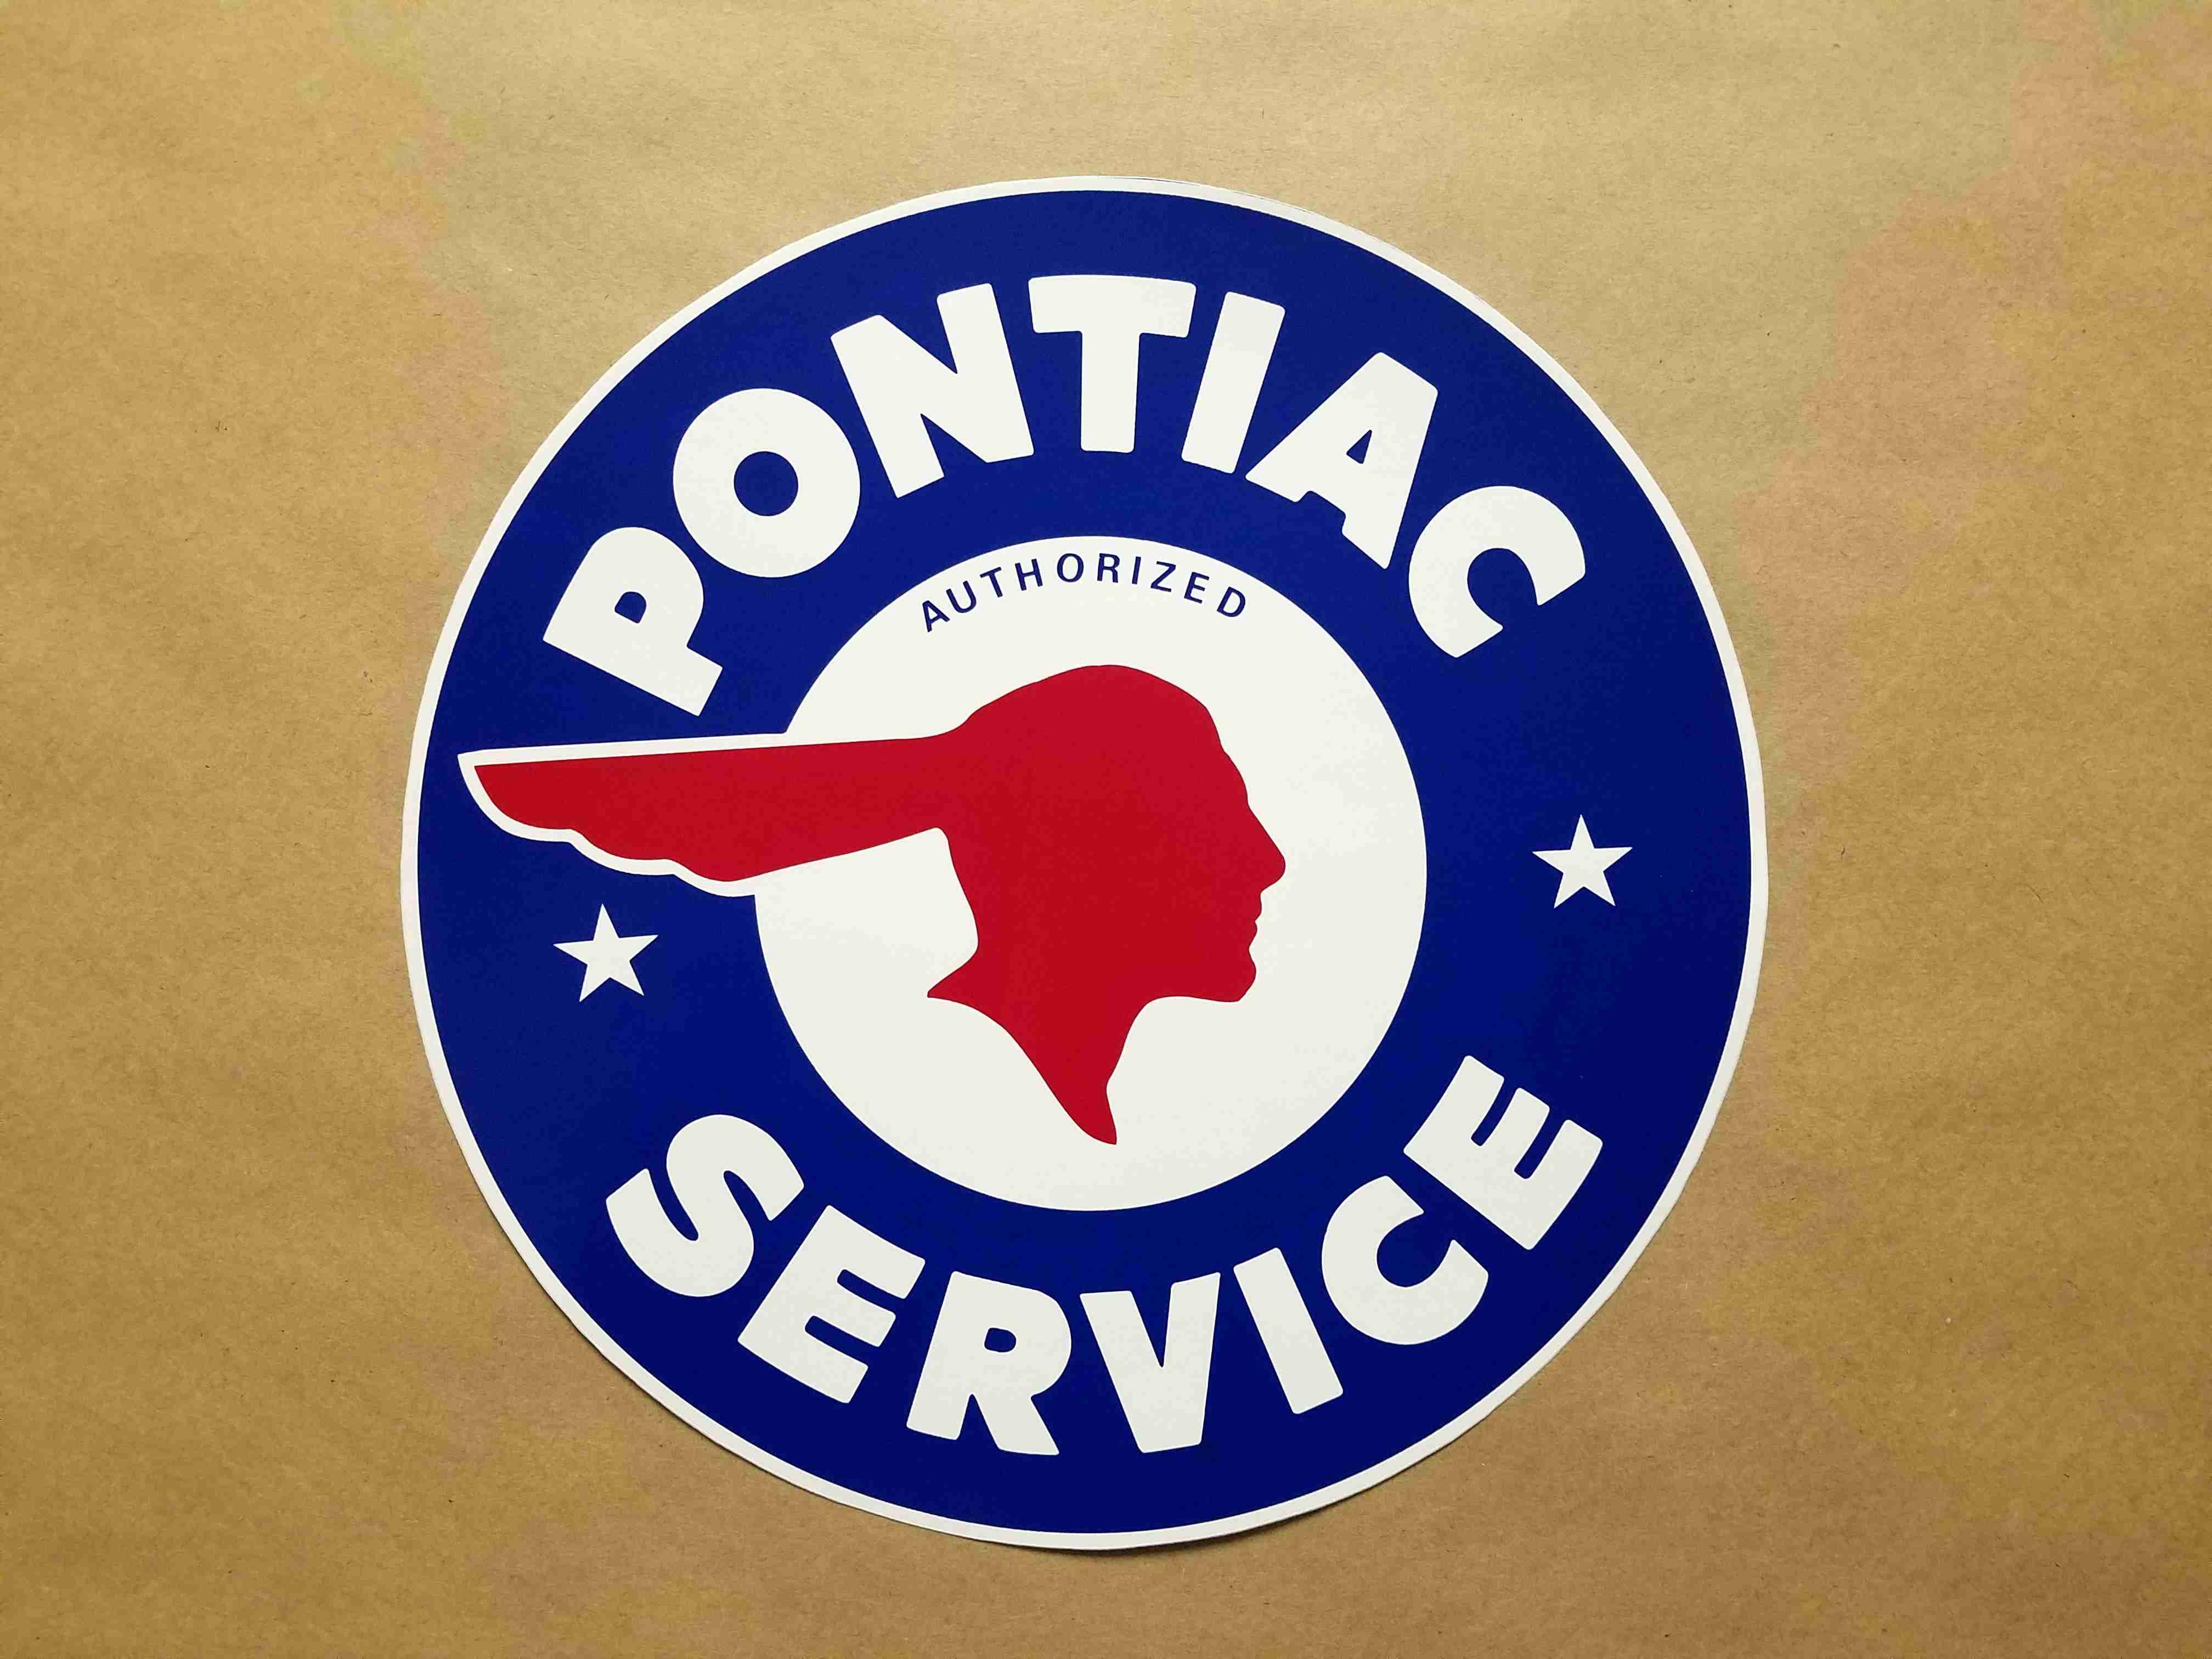 "1926-58 10"" Round Indian Head ""Pontiac Authorized Service"" Decal"